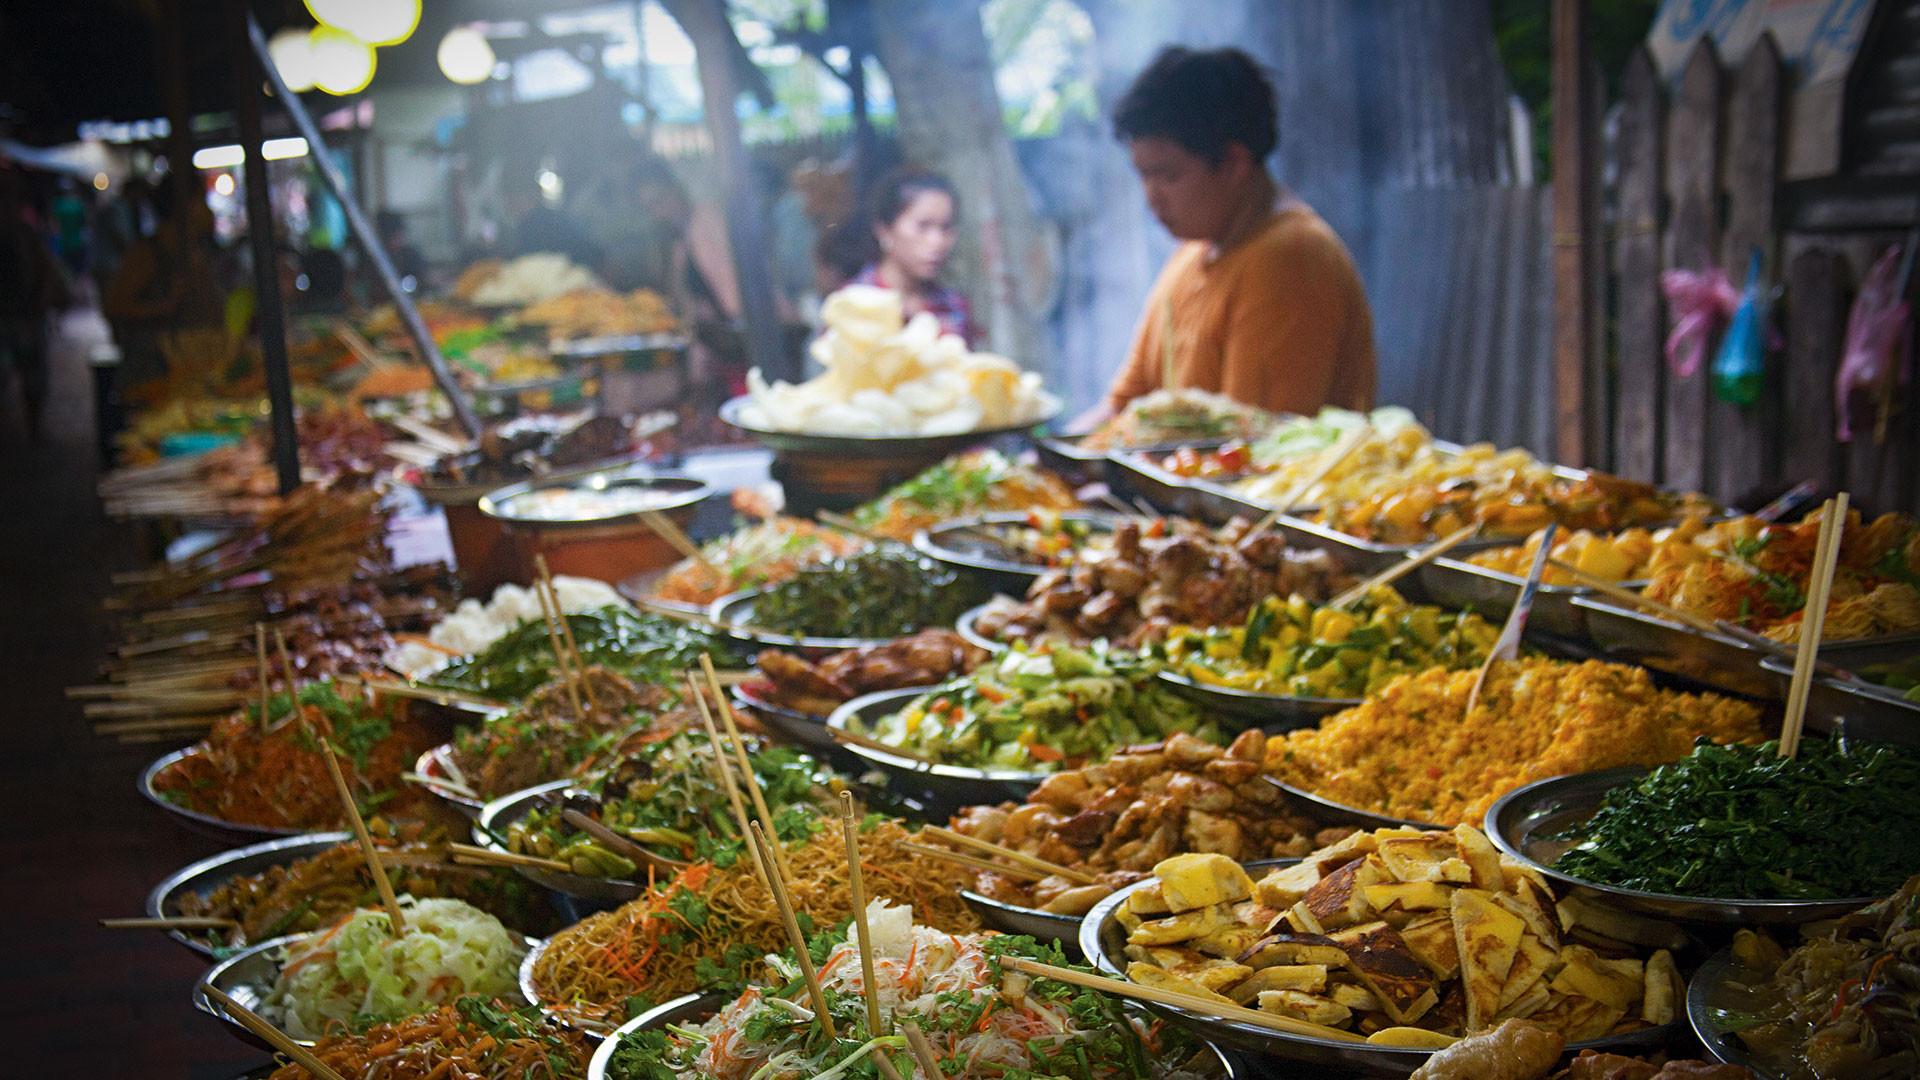 Street food in Bangkok, Thailand. Photograph by Alexander Scheible/Alamy